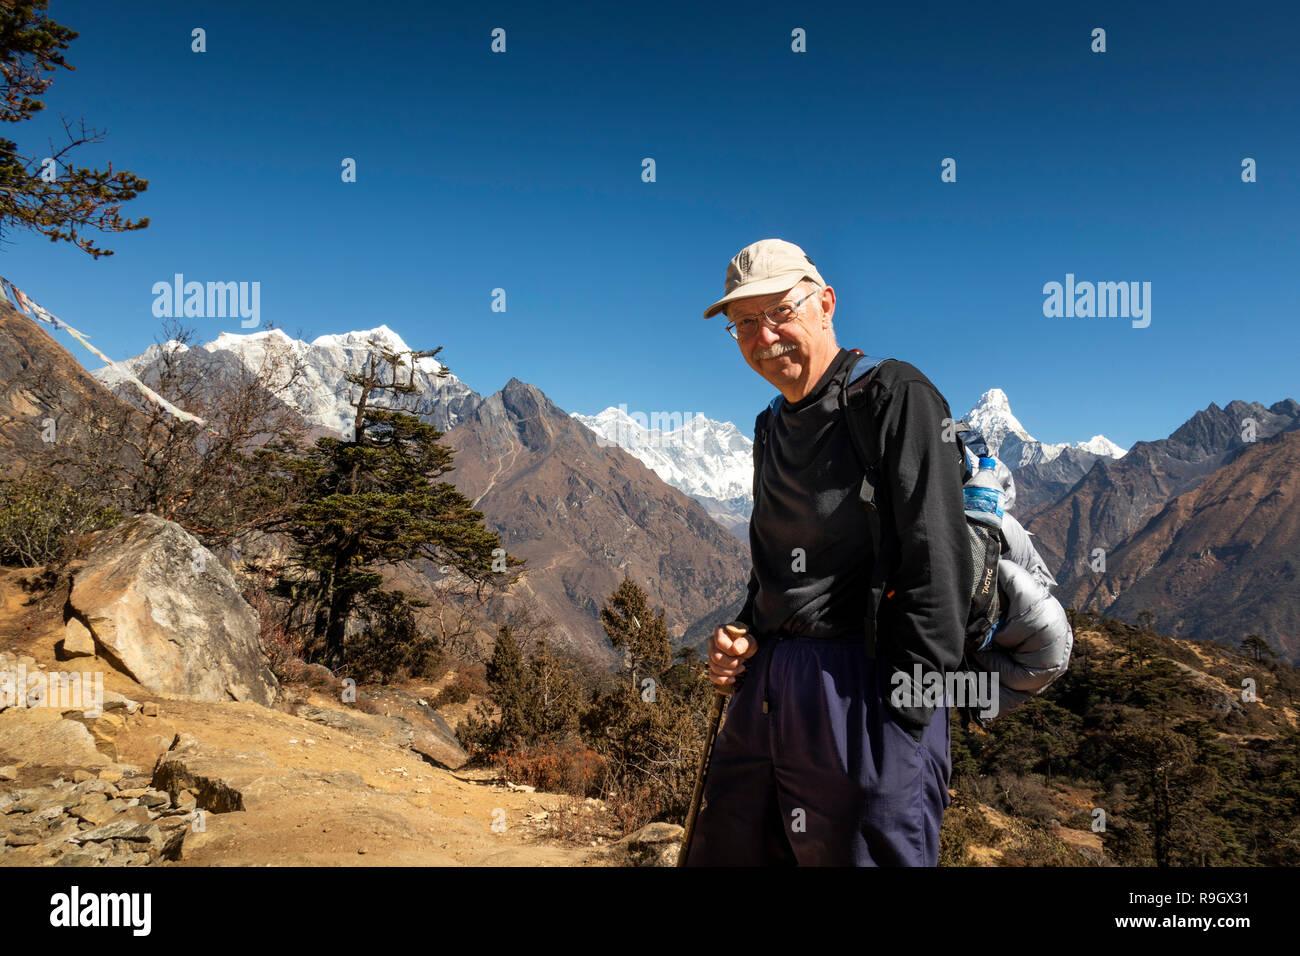 Nepal, Everest Base Camp Trek, older male trekker enjoying view of Mount Everest and surrounding Himalayan mountains - Stock Image